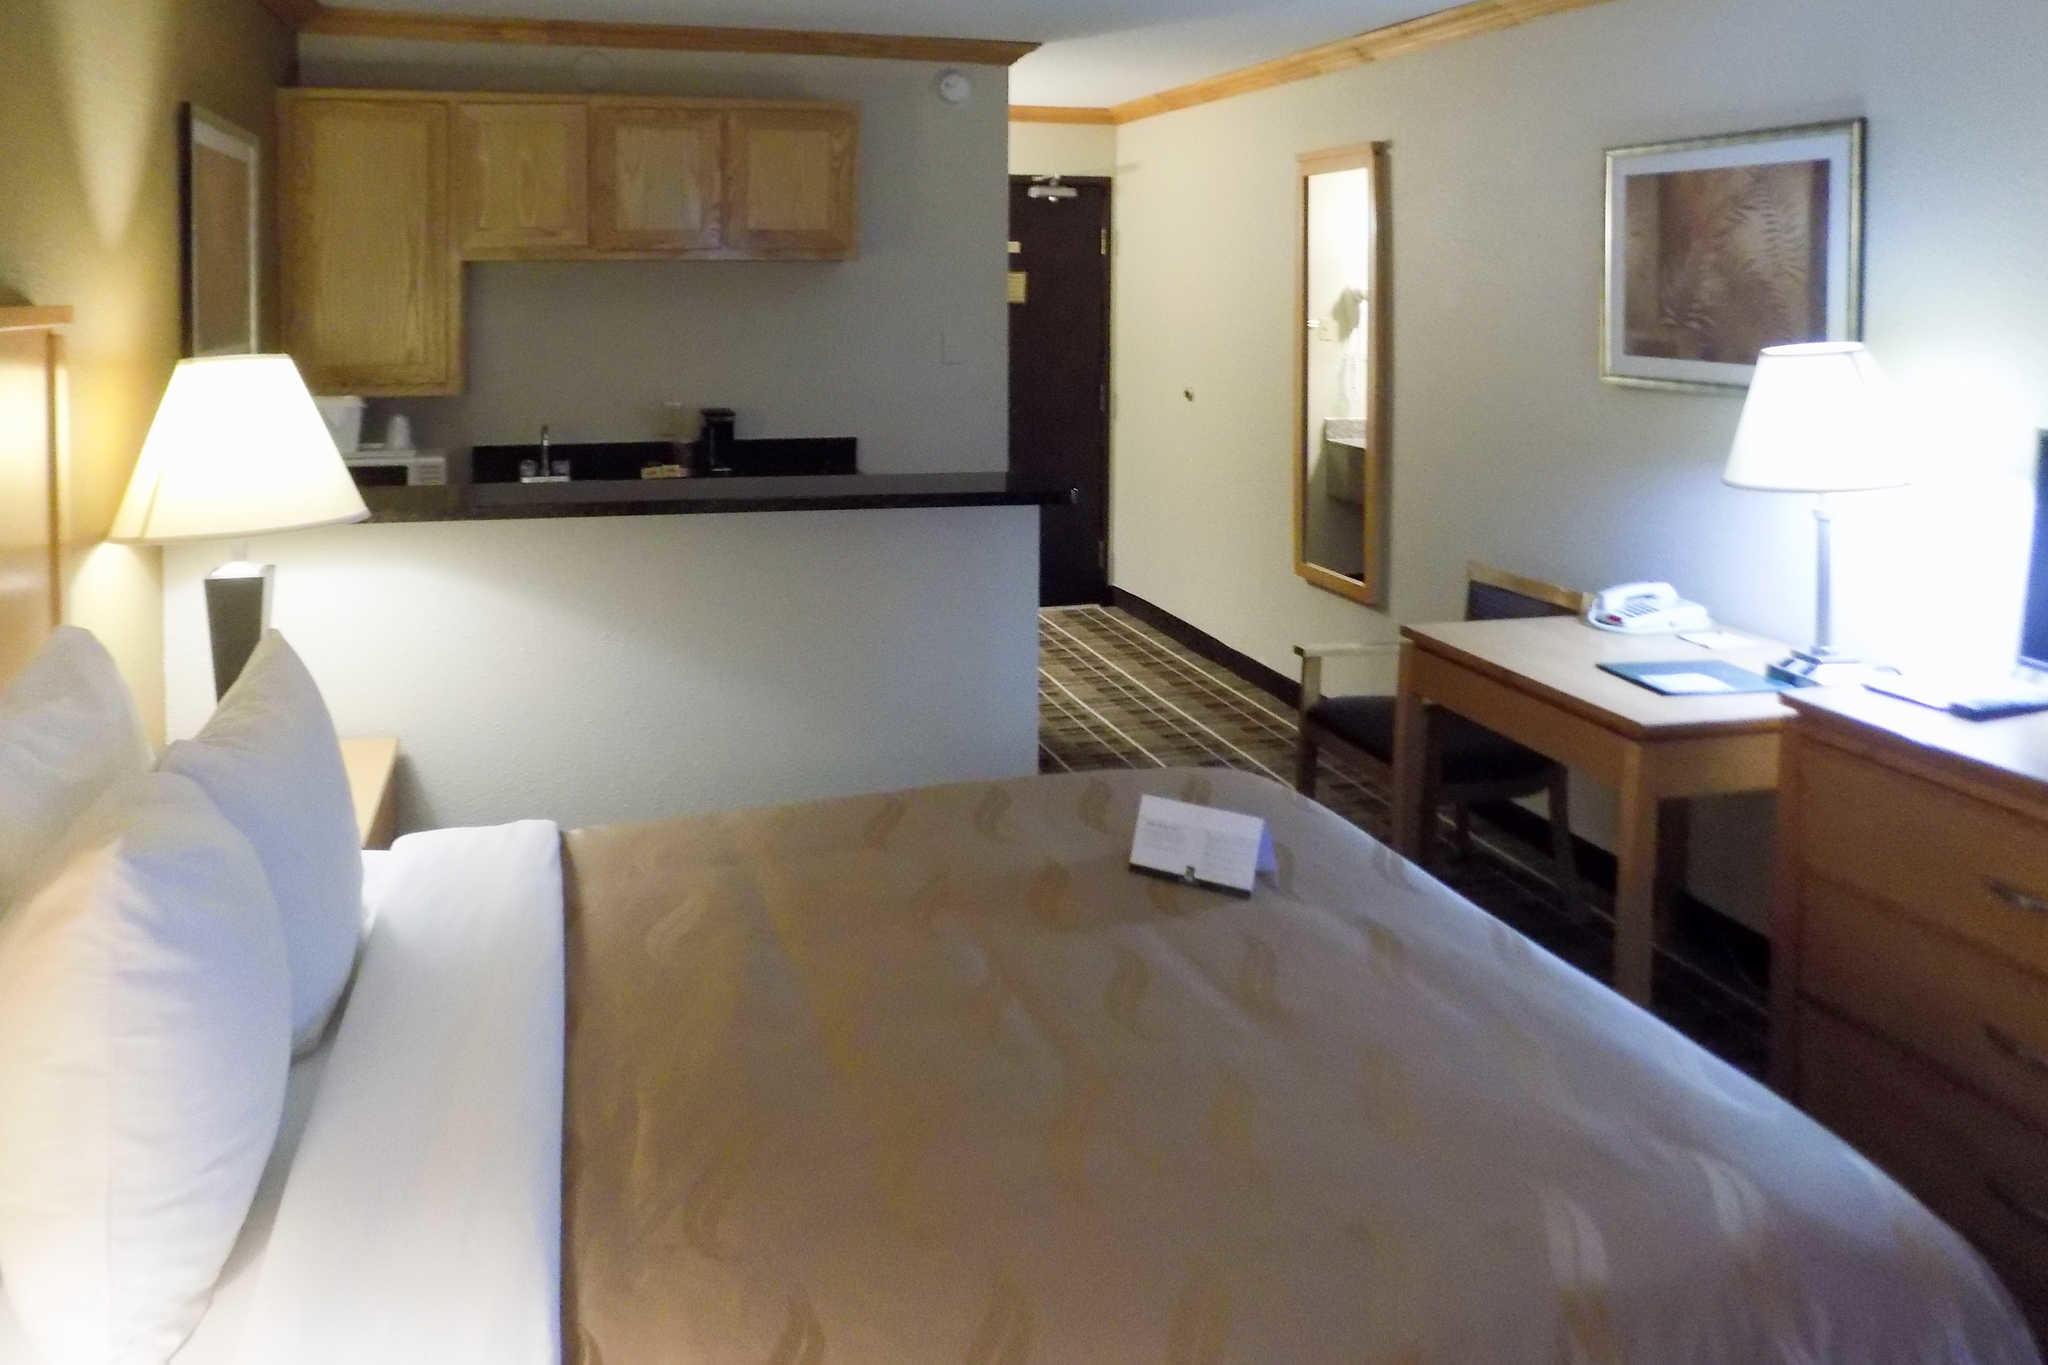 Quality Inn Dfw Airport Hotel